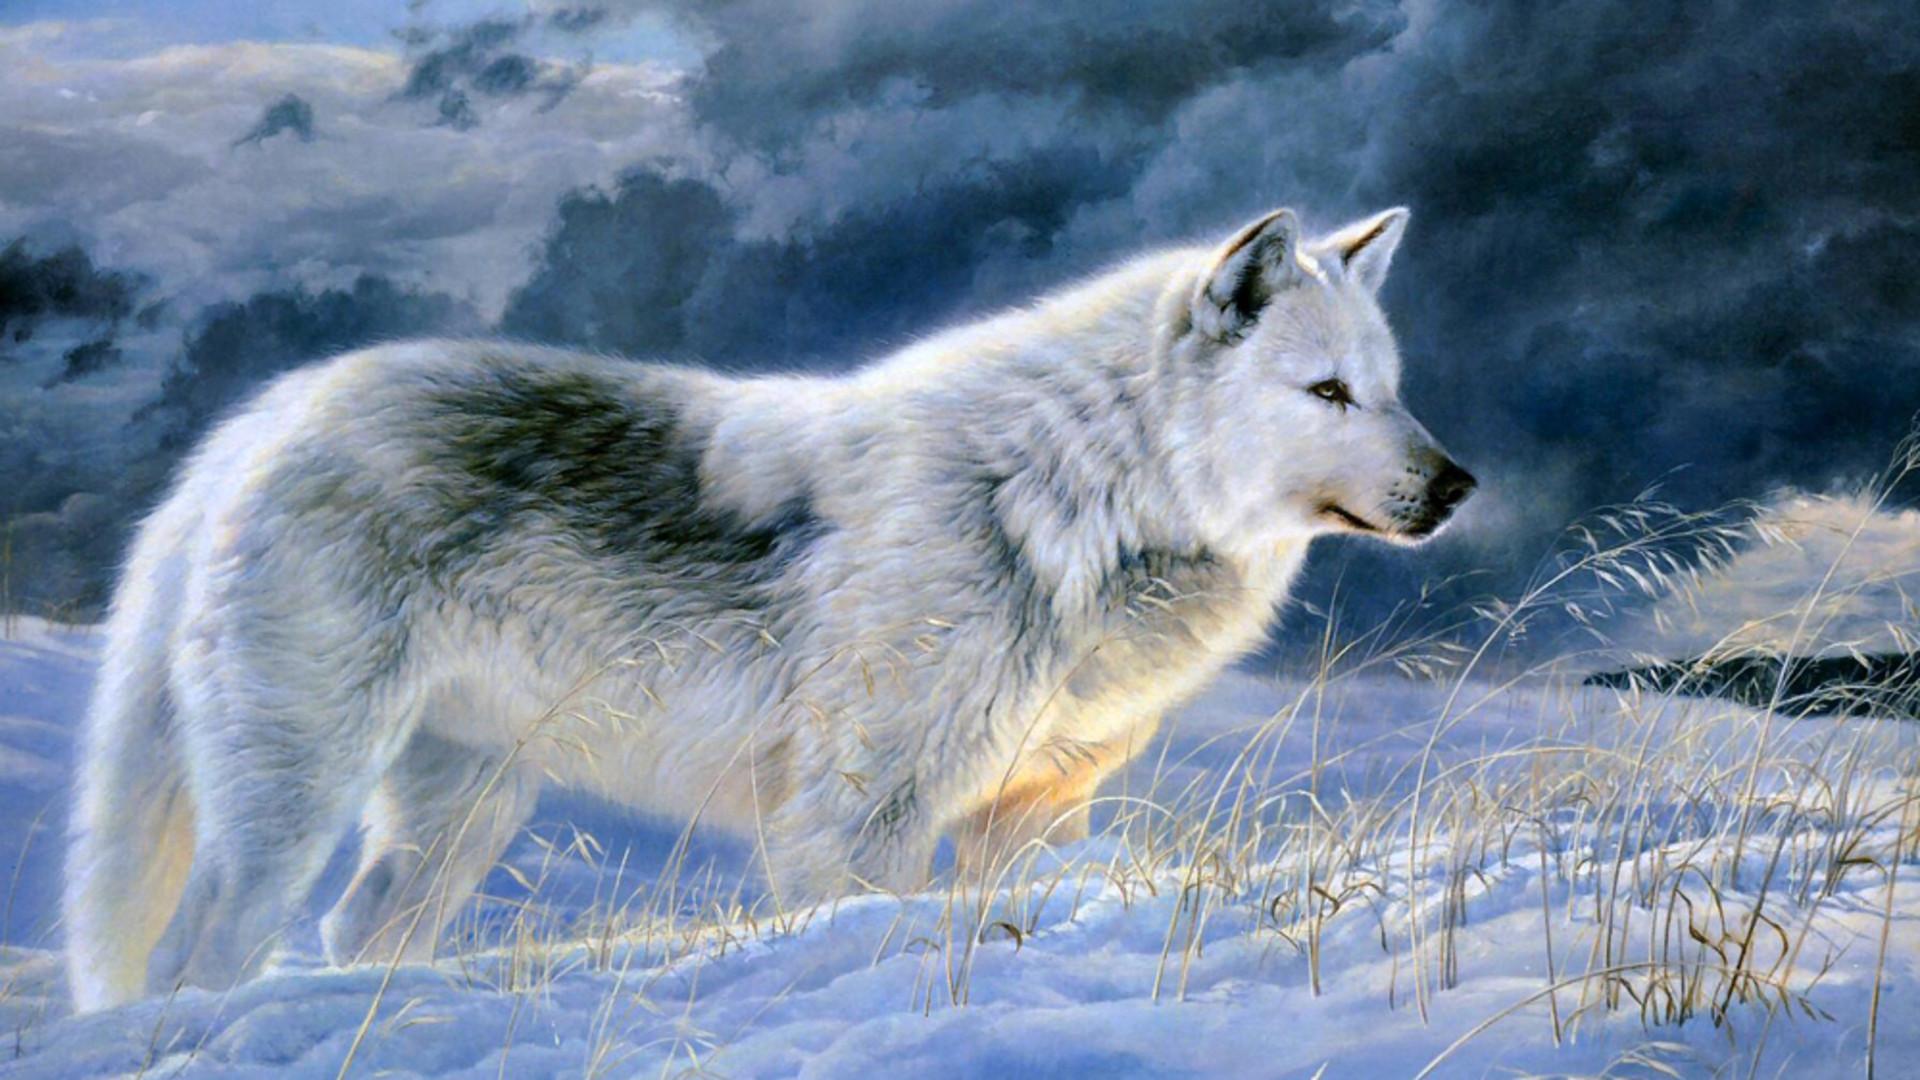 Wonderful Gray Wolf Wallpaper 1080p - 938092-cool-gray-wolf-wallpaper-1920x1080-samsung-galaxy  Graphic_707155.jpg